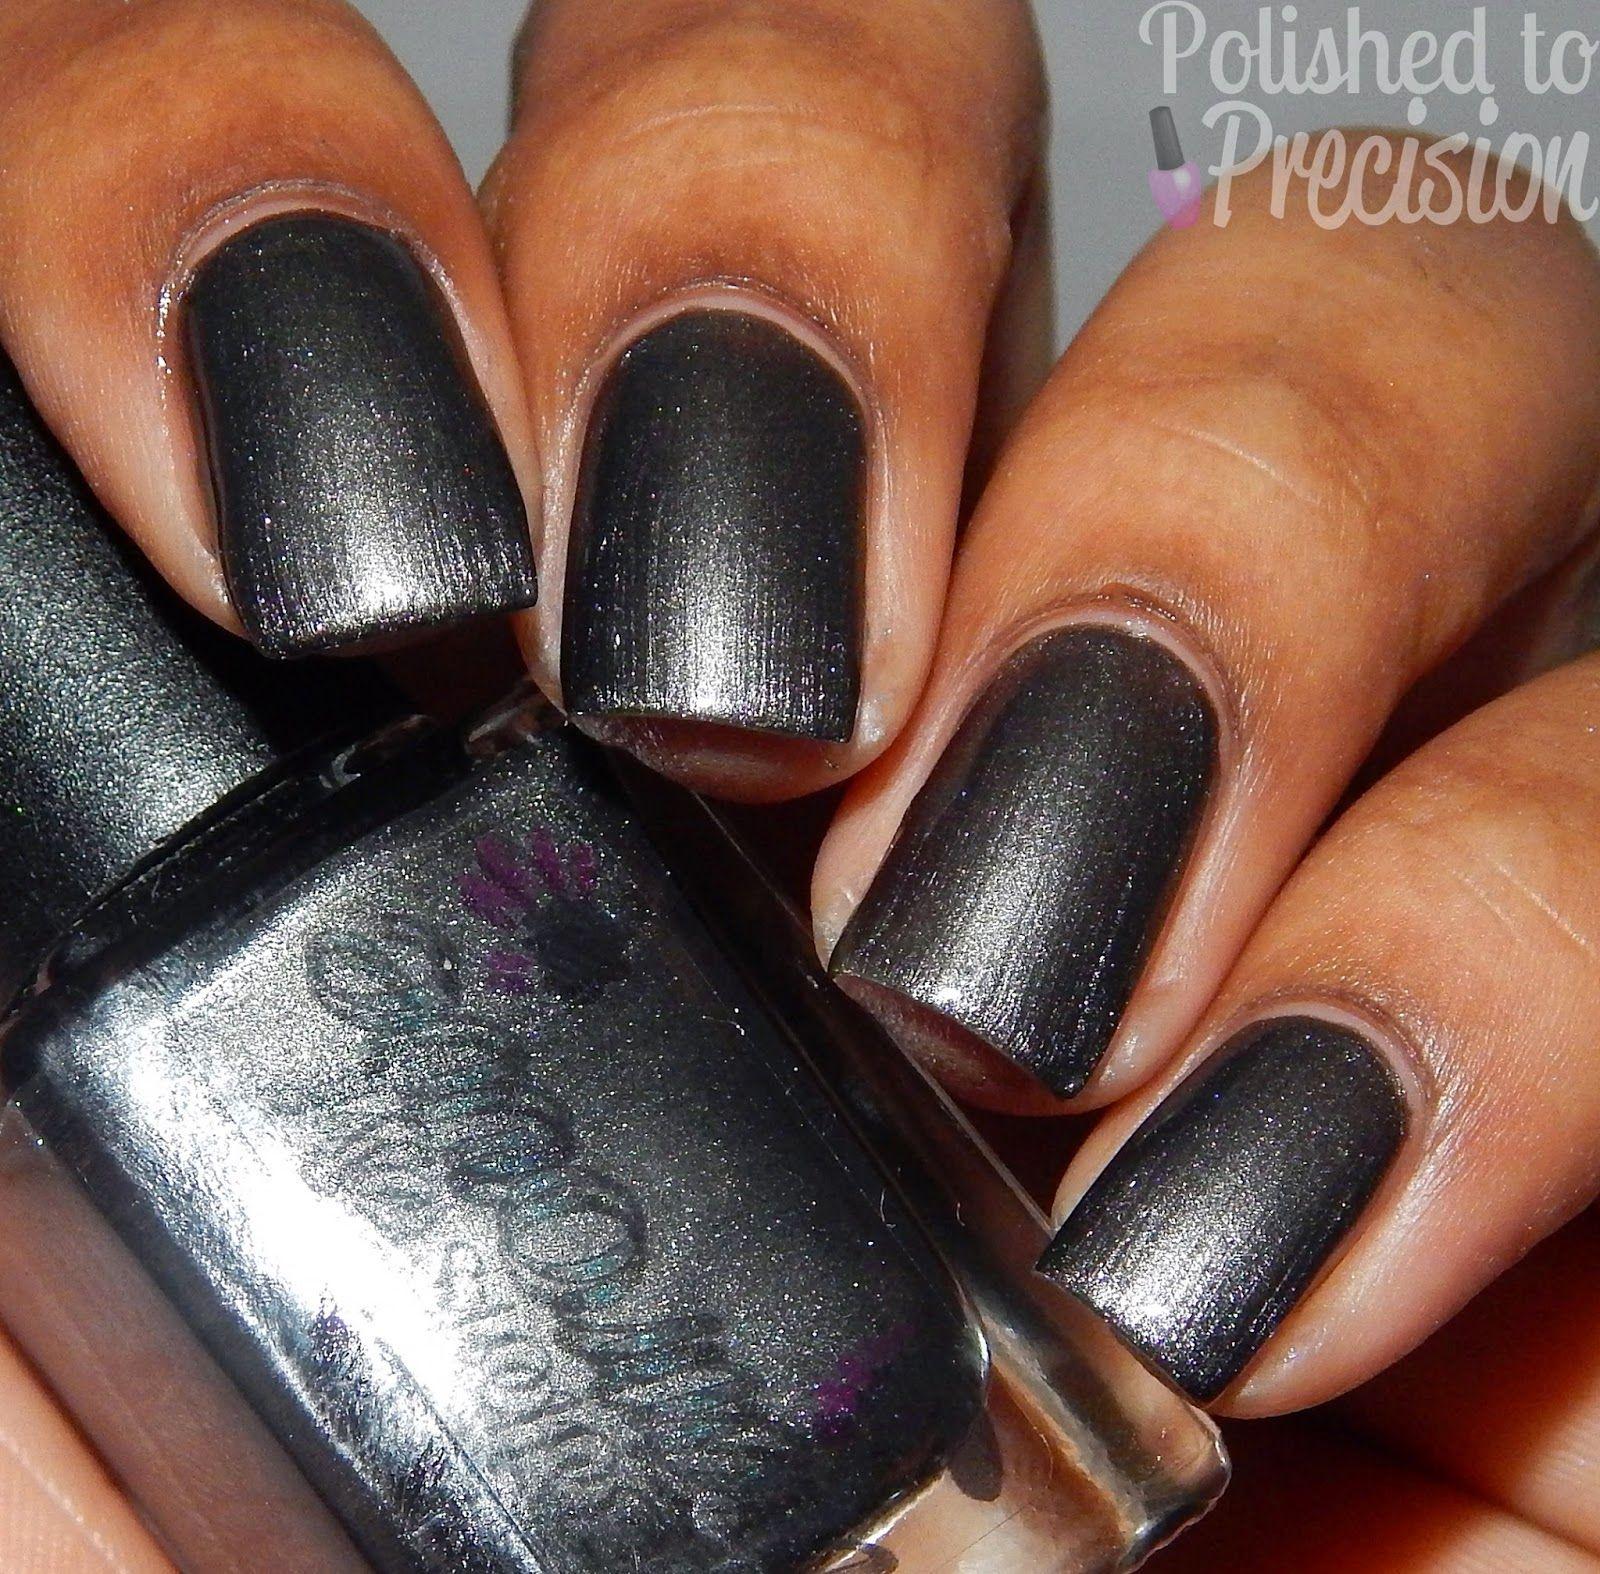 CBL Mystique - sw on nail ring - $5